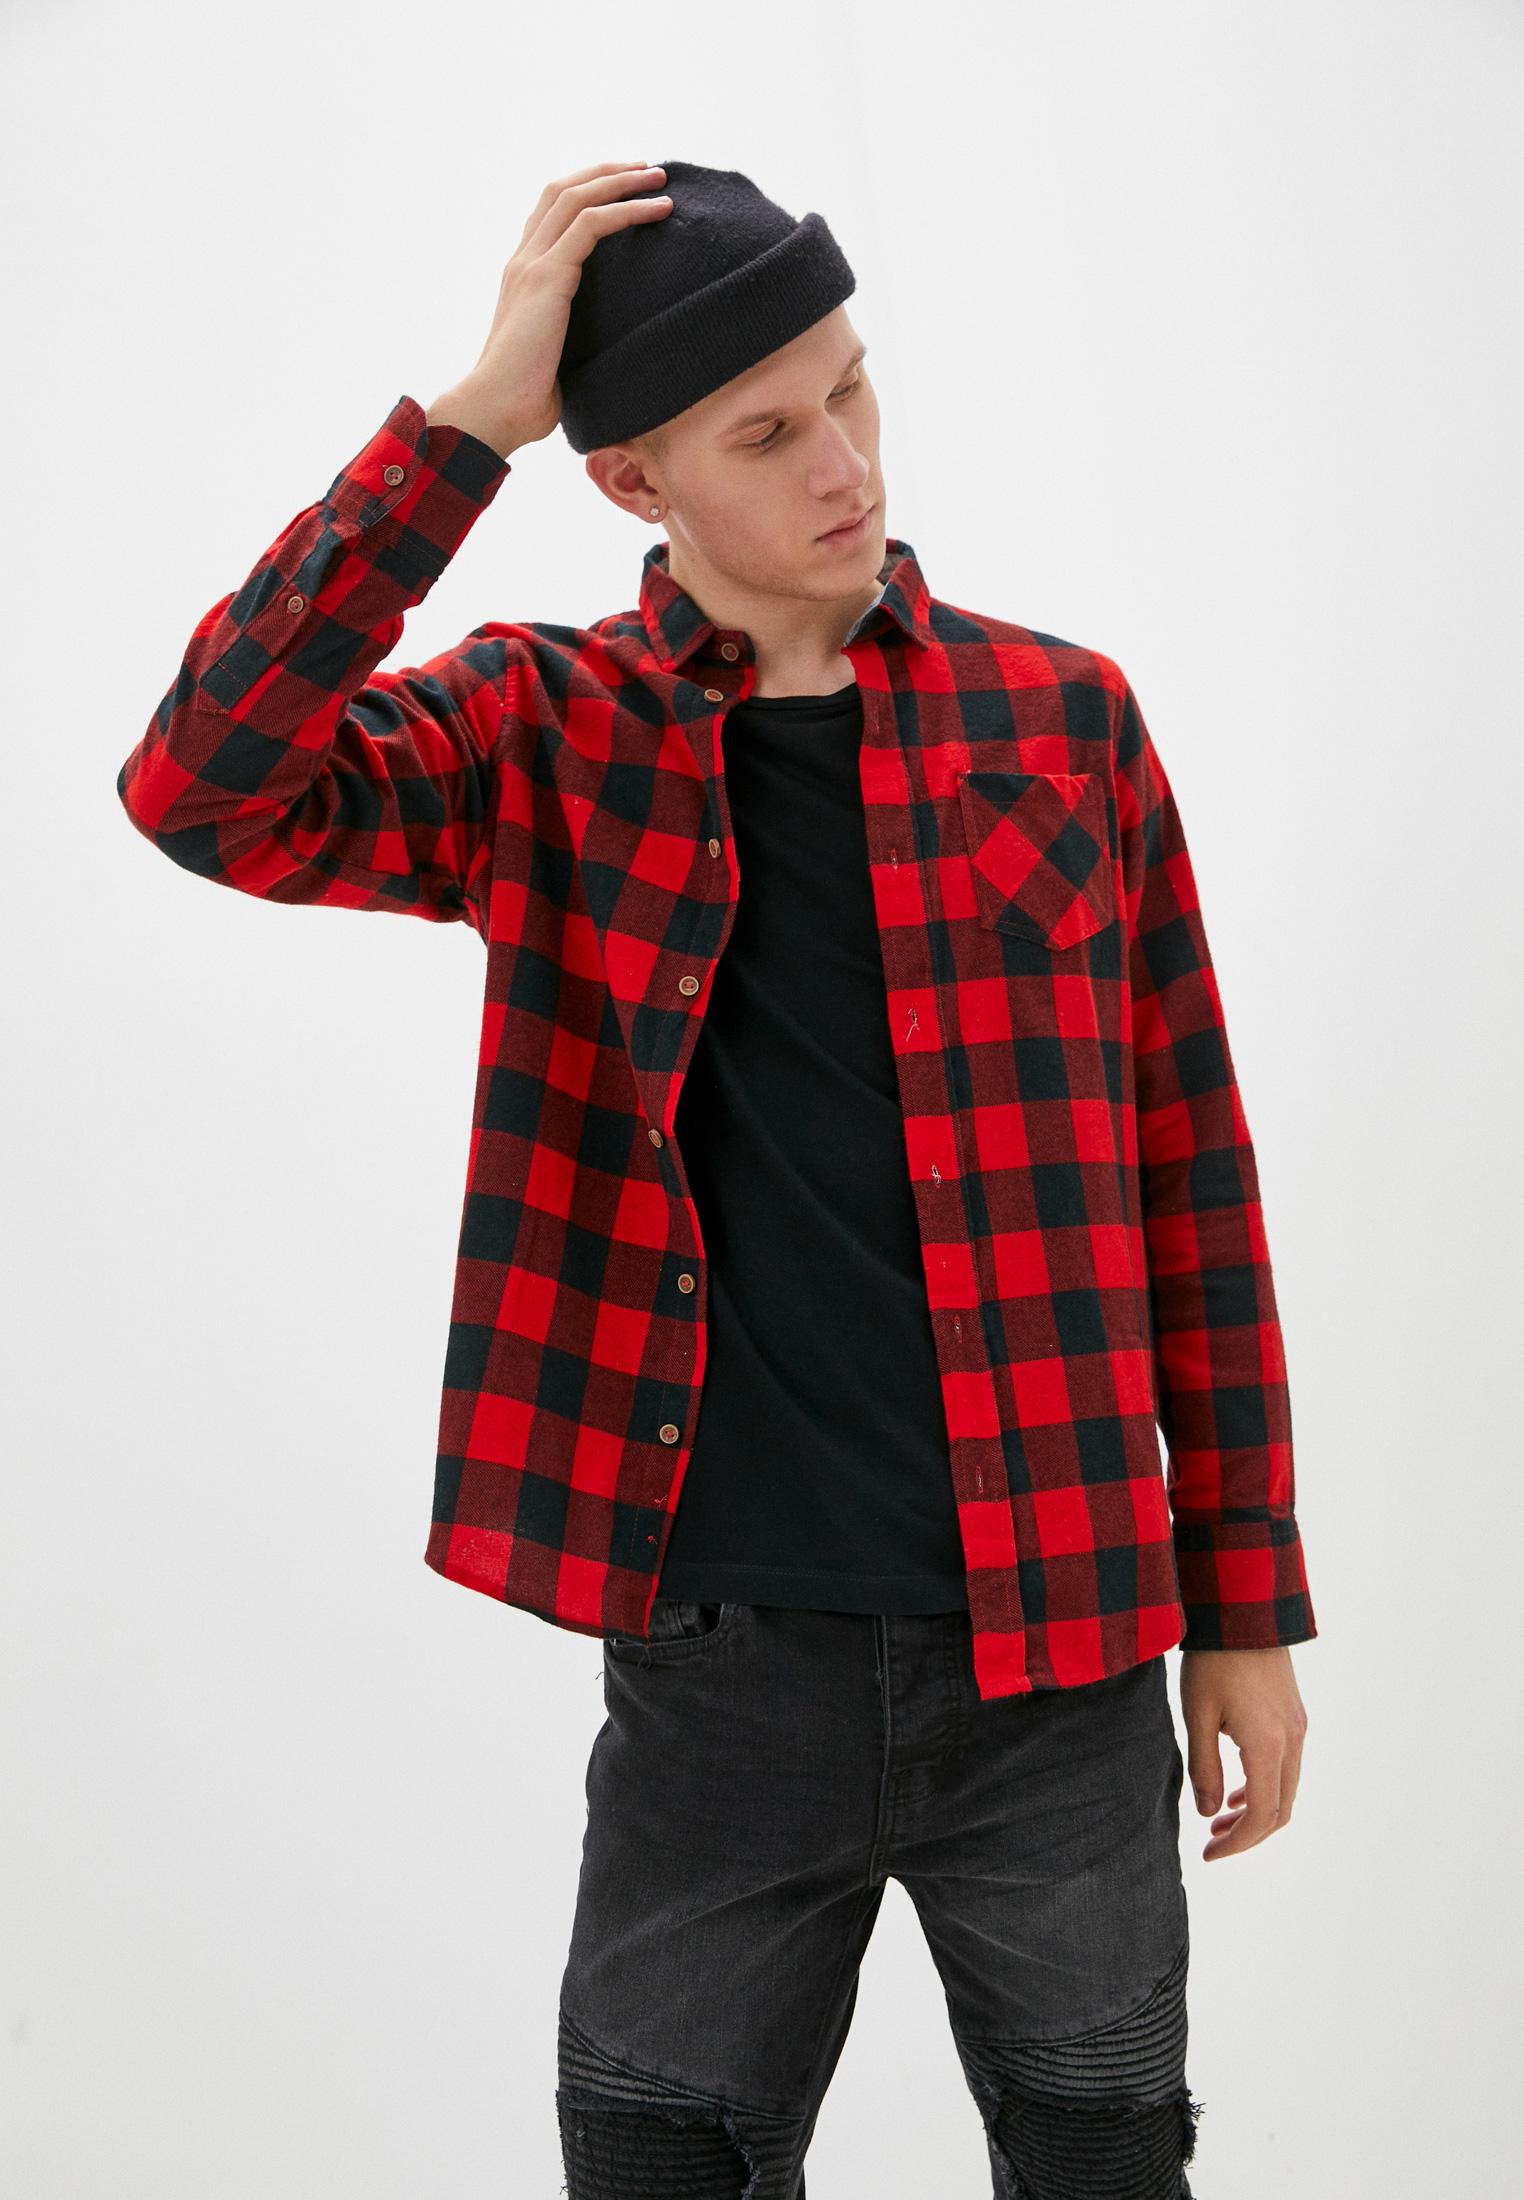 Рубашка с длинным рукавом Brave Soul (Брейв Соул) MSH-69JACKL